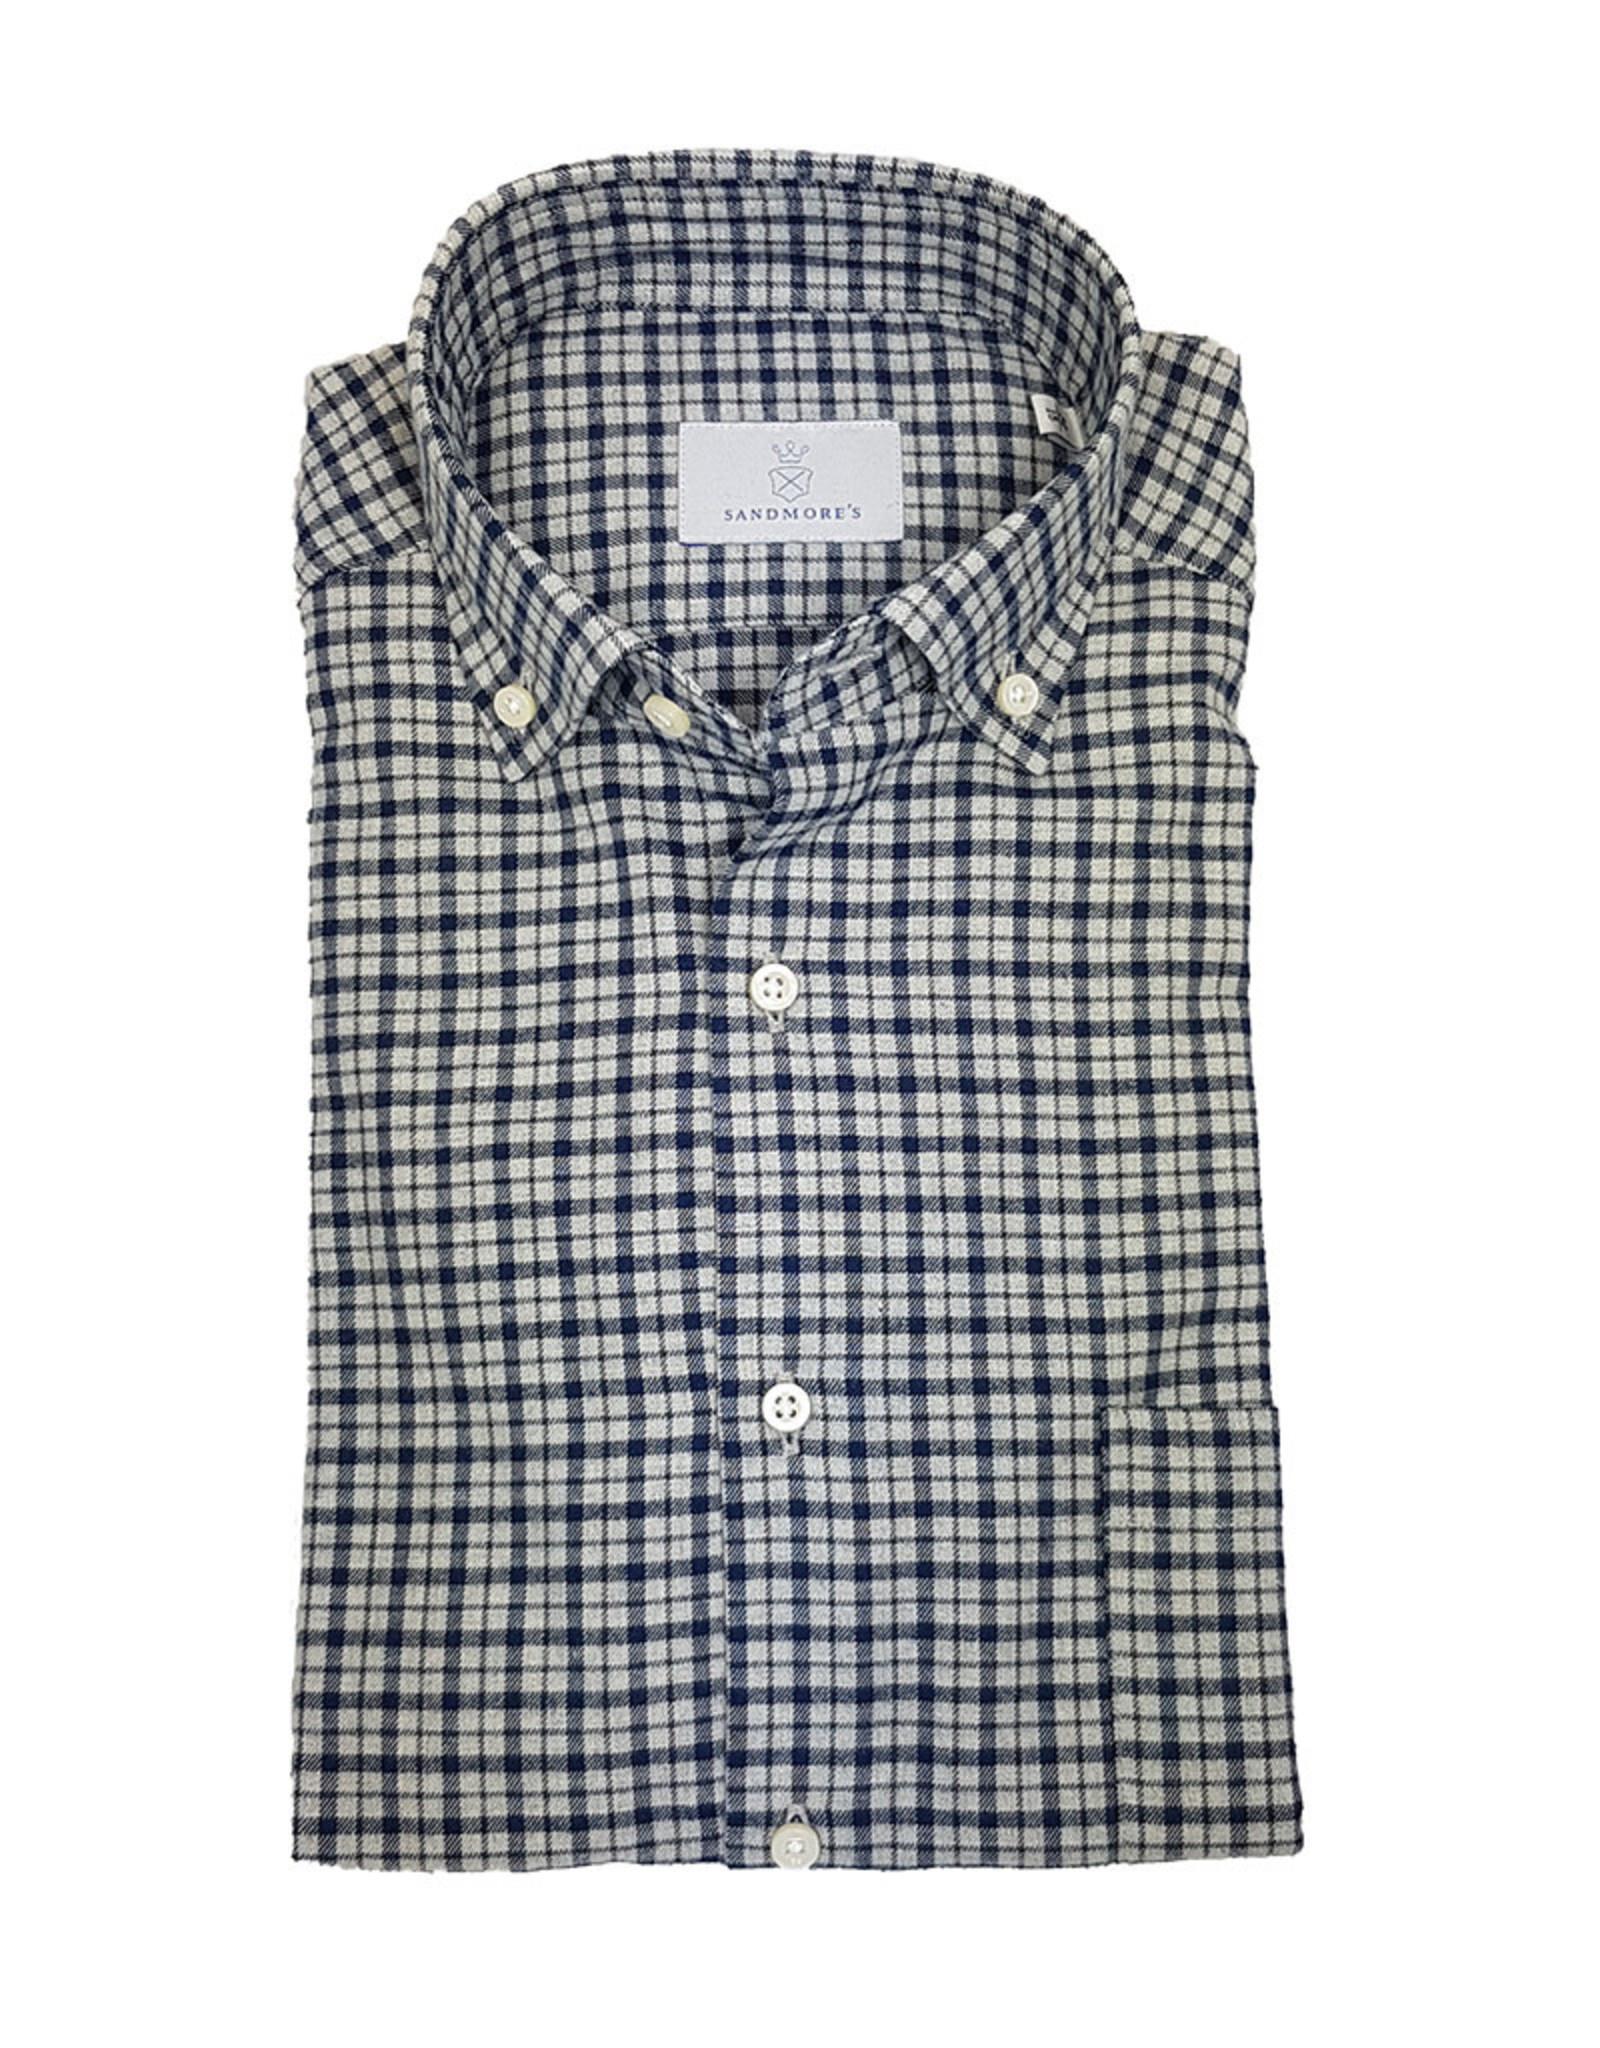 Ghirardelli Sandmore's hemd blauw flannel Fitted body N1117